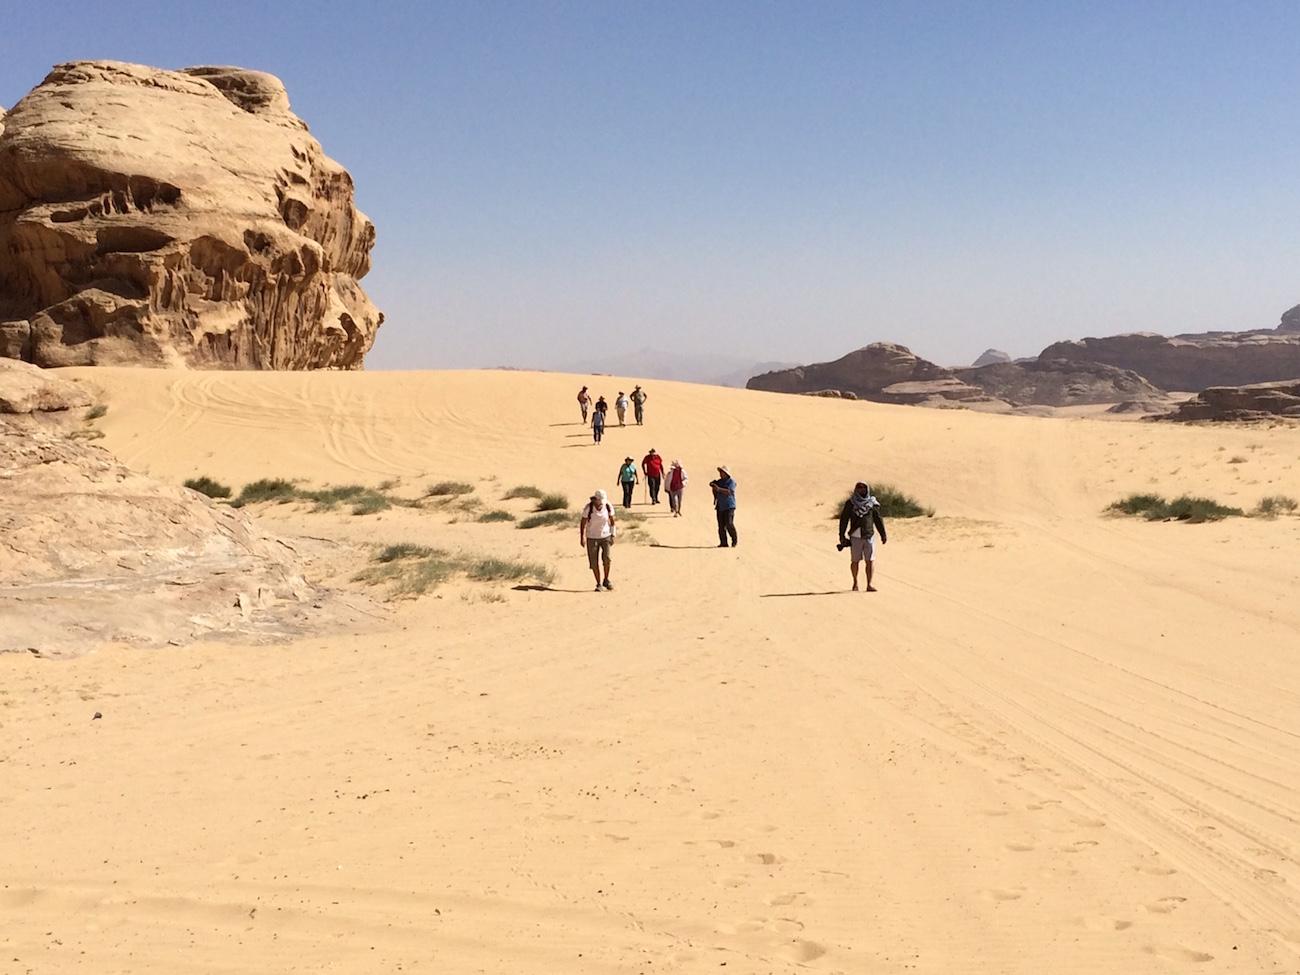 Students Jordan Hiking Desert 2